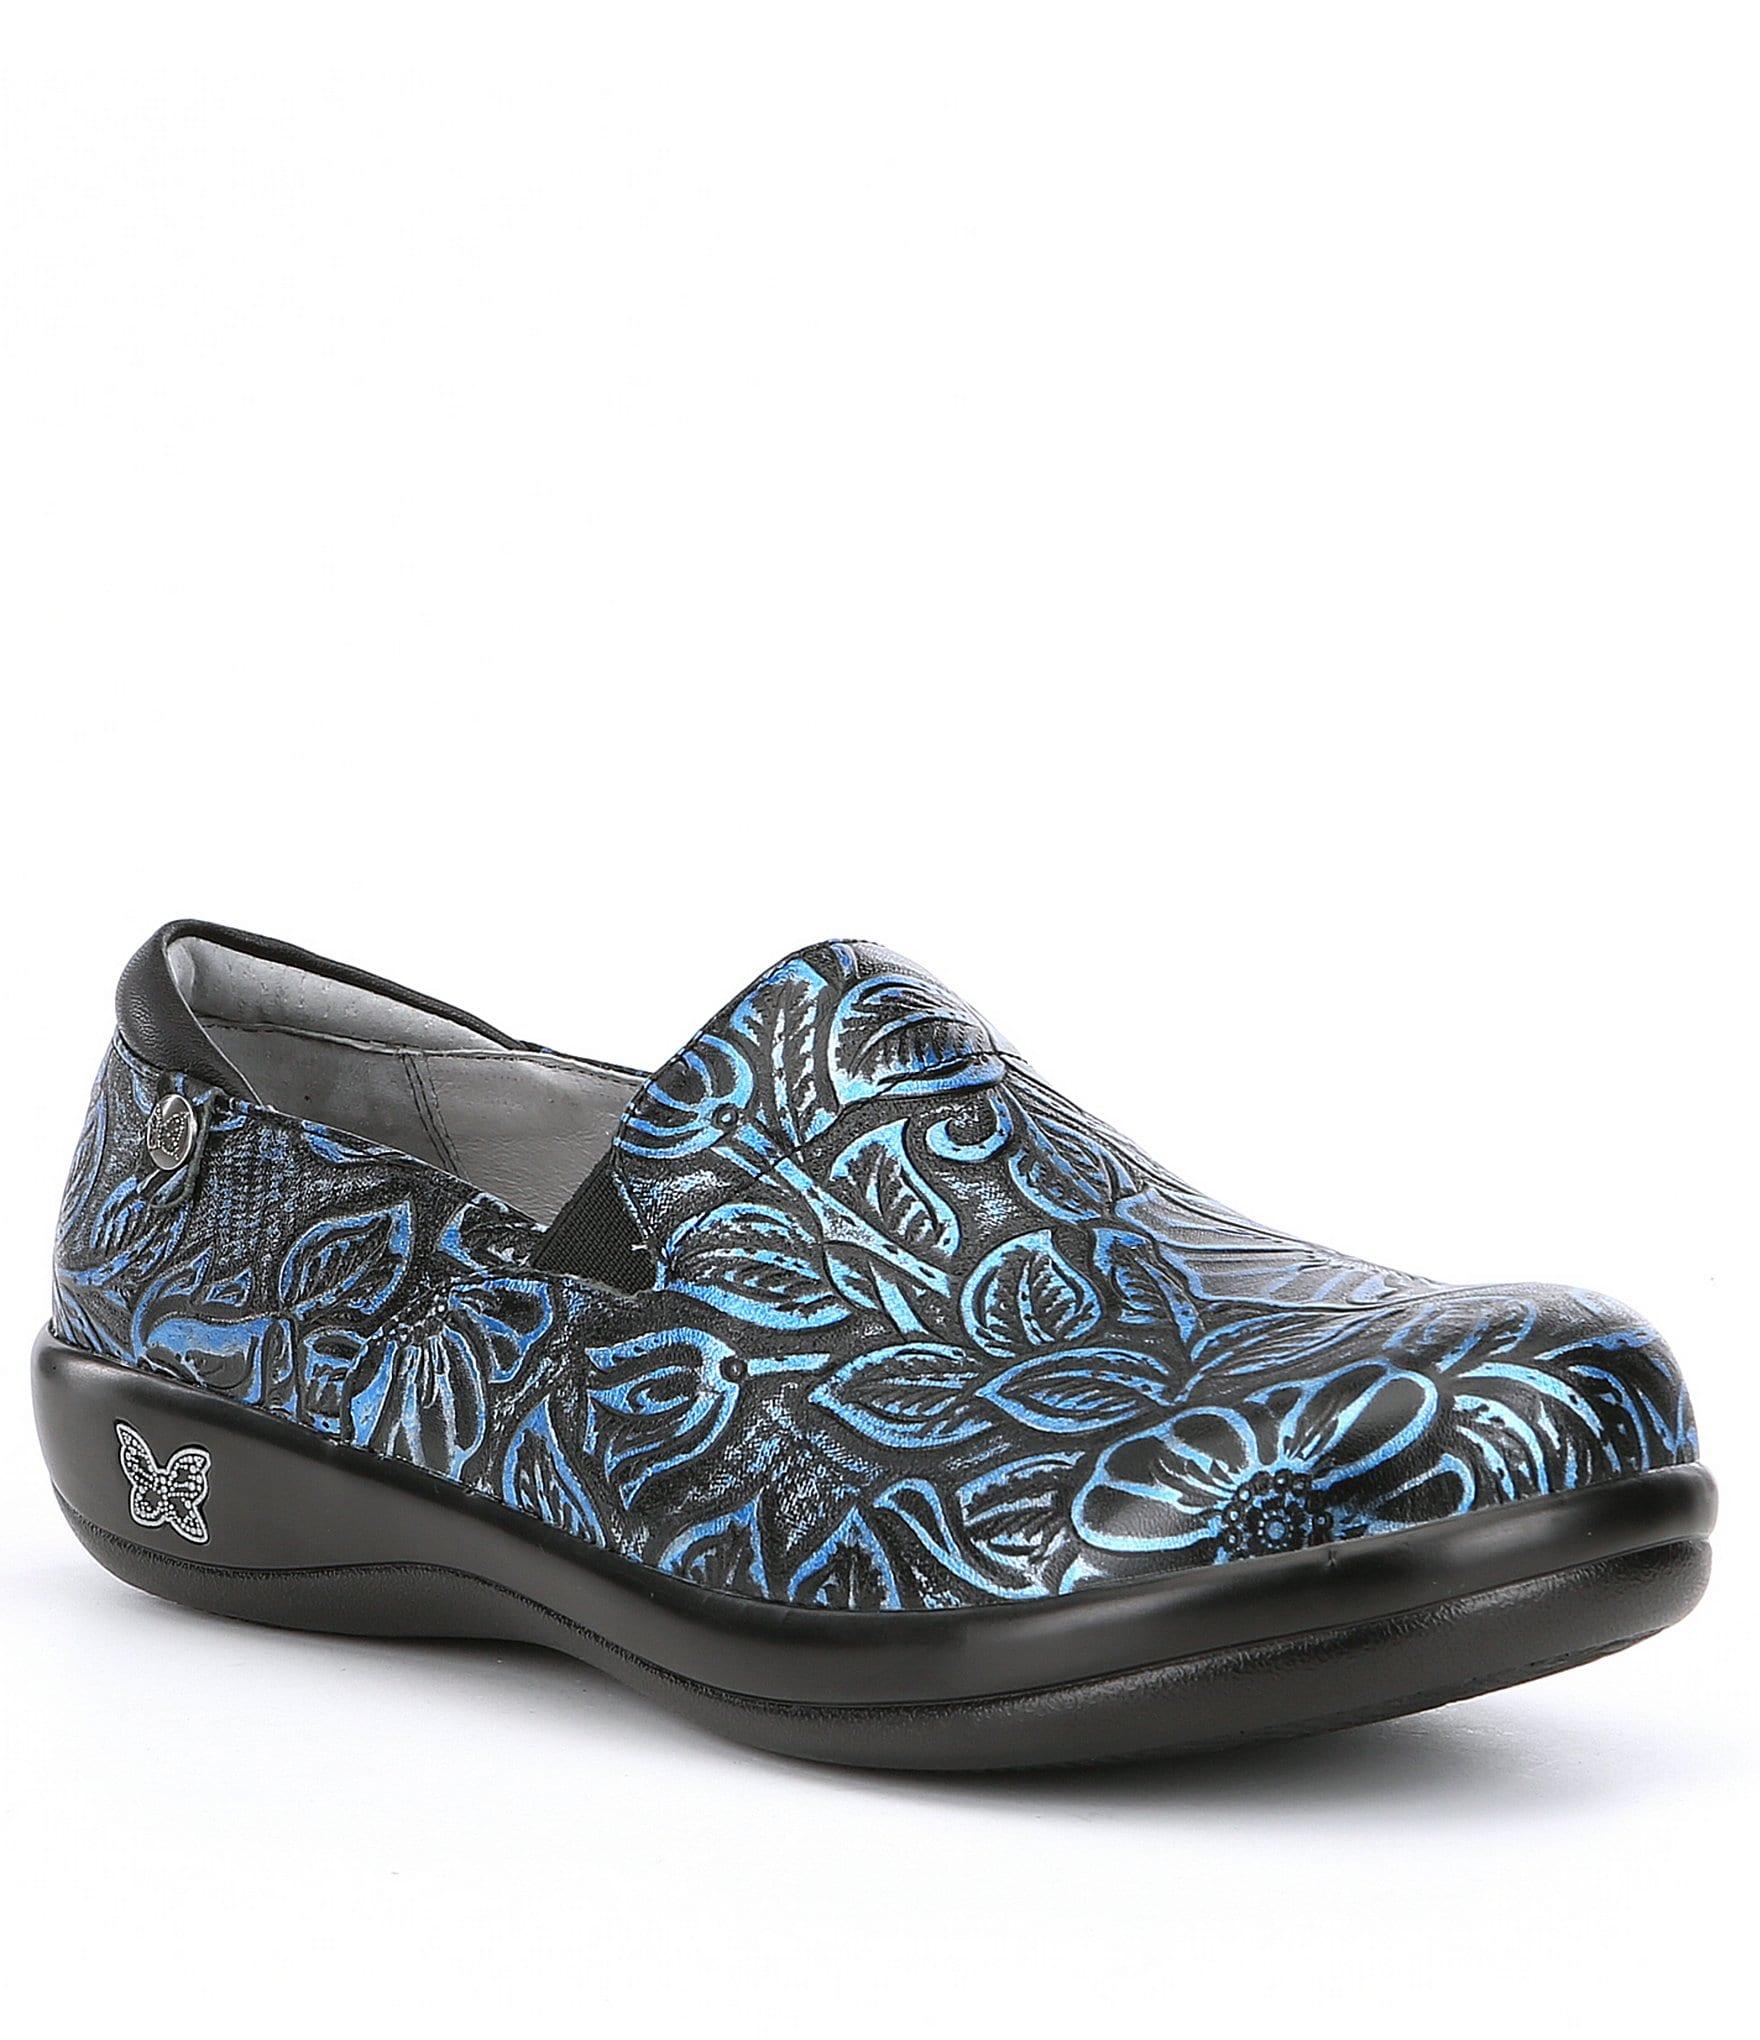 Alegria Shoes On Sale Dillards